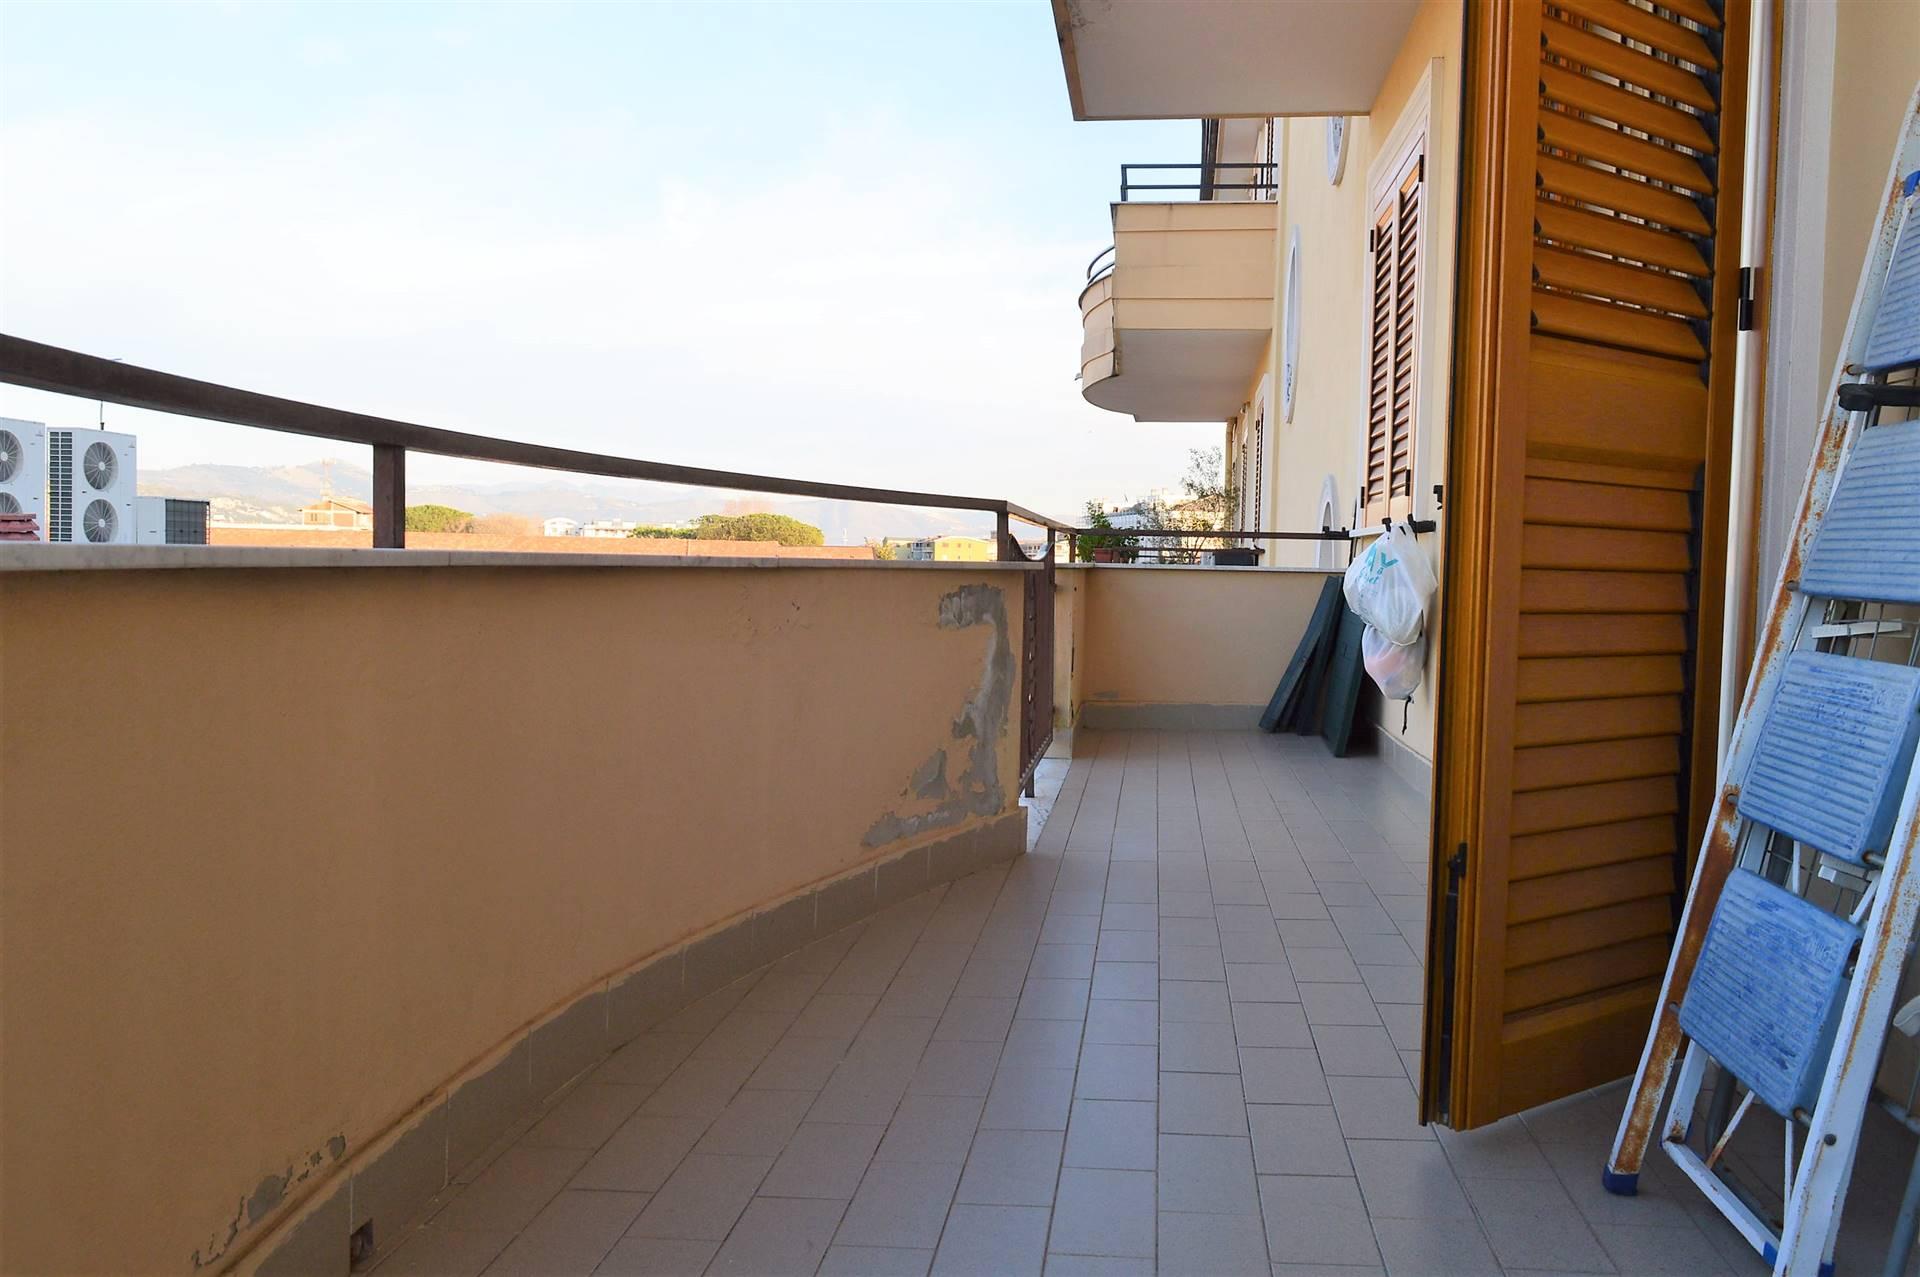 AV918B-Appartamento-SANTA-MARIA-CAPUA-VETERE-Traversa-Mario-Fiore